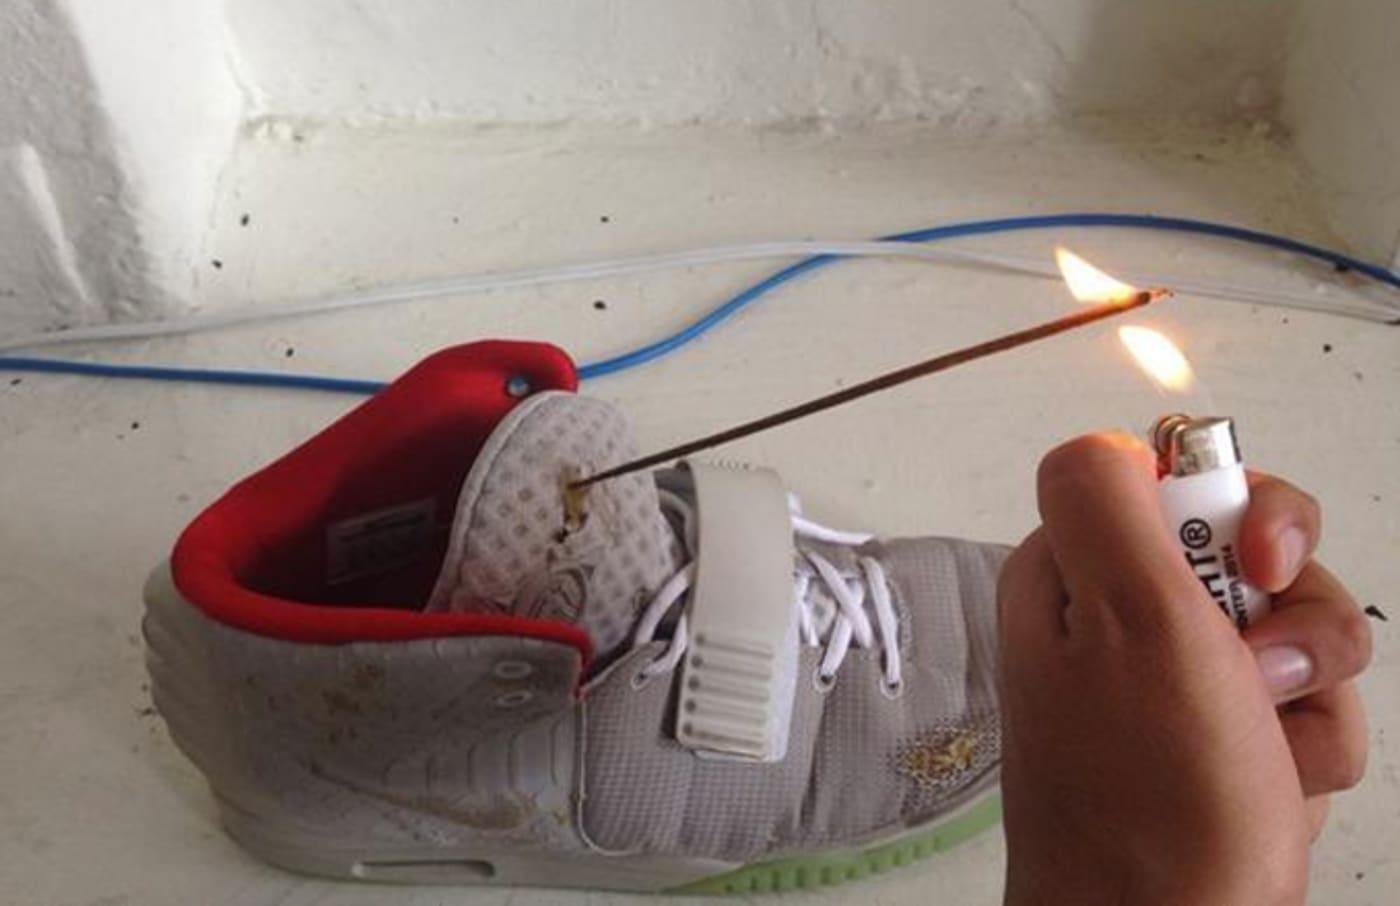 Air Yeezy II Incense Holder